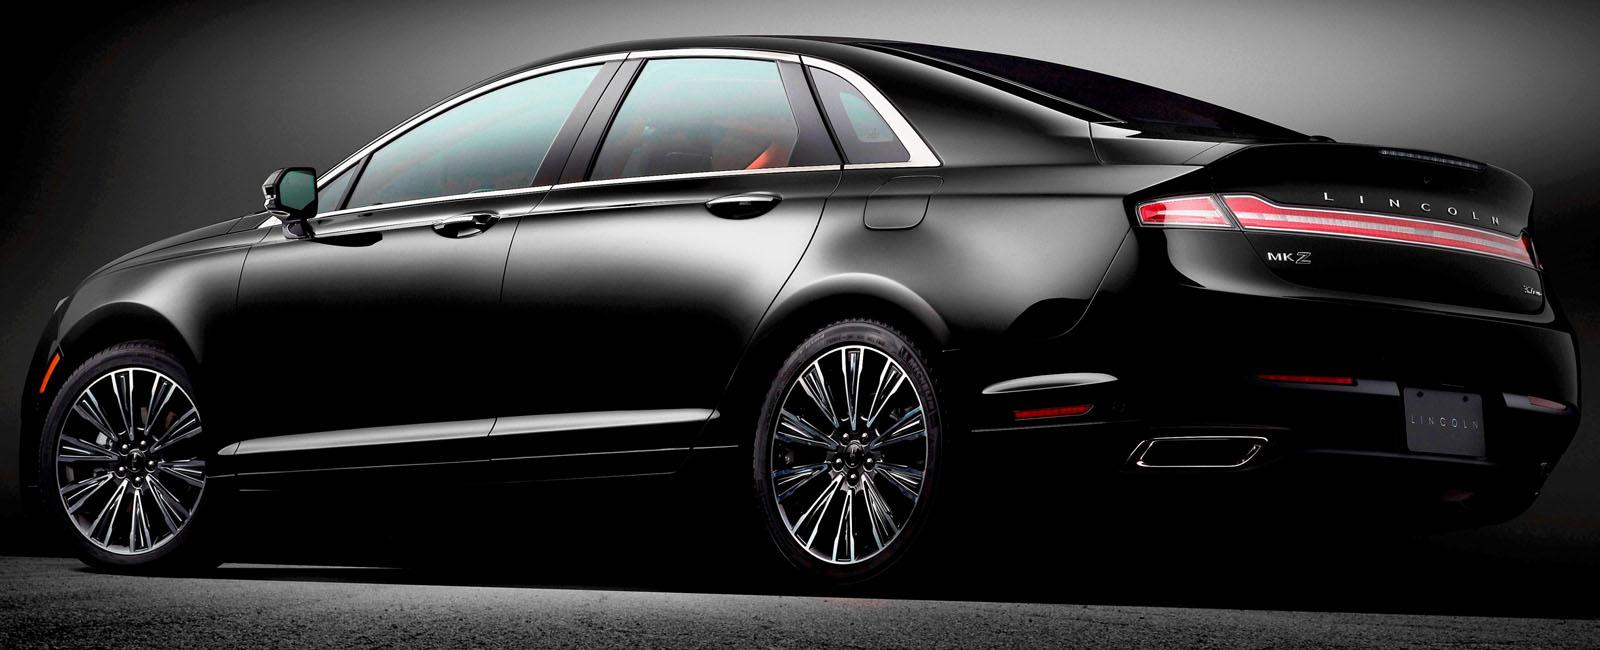 Sedans Com Worldwide Chauffeured Transportationsedans Com